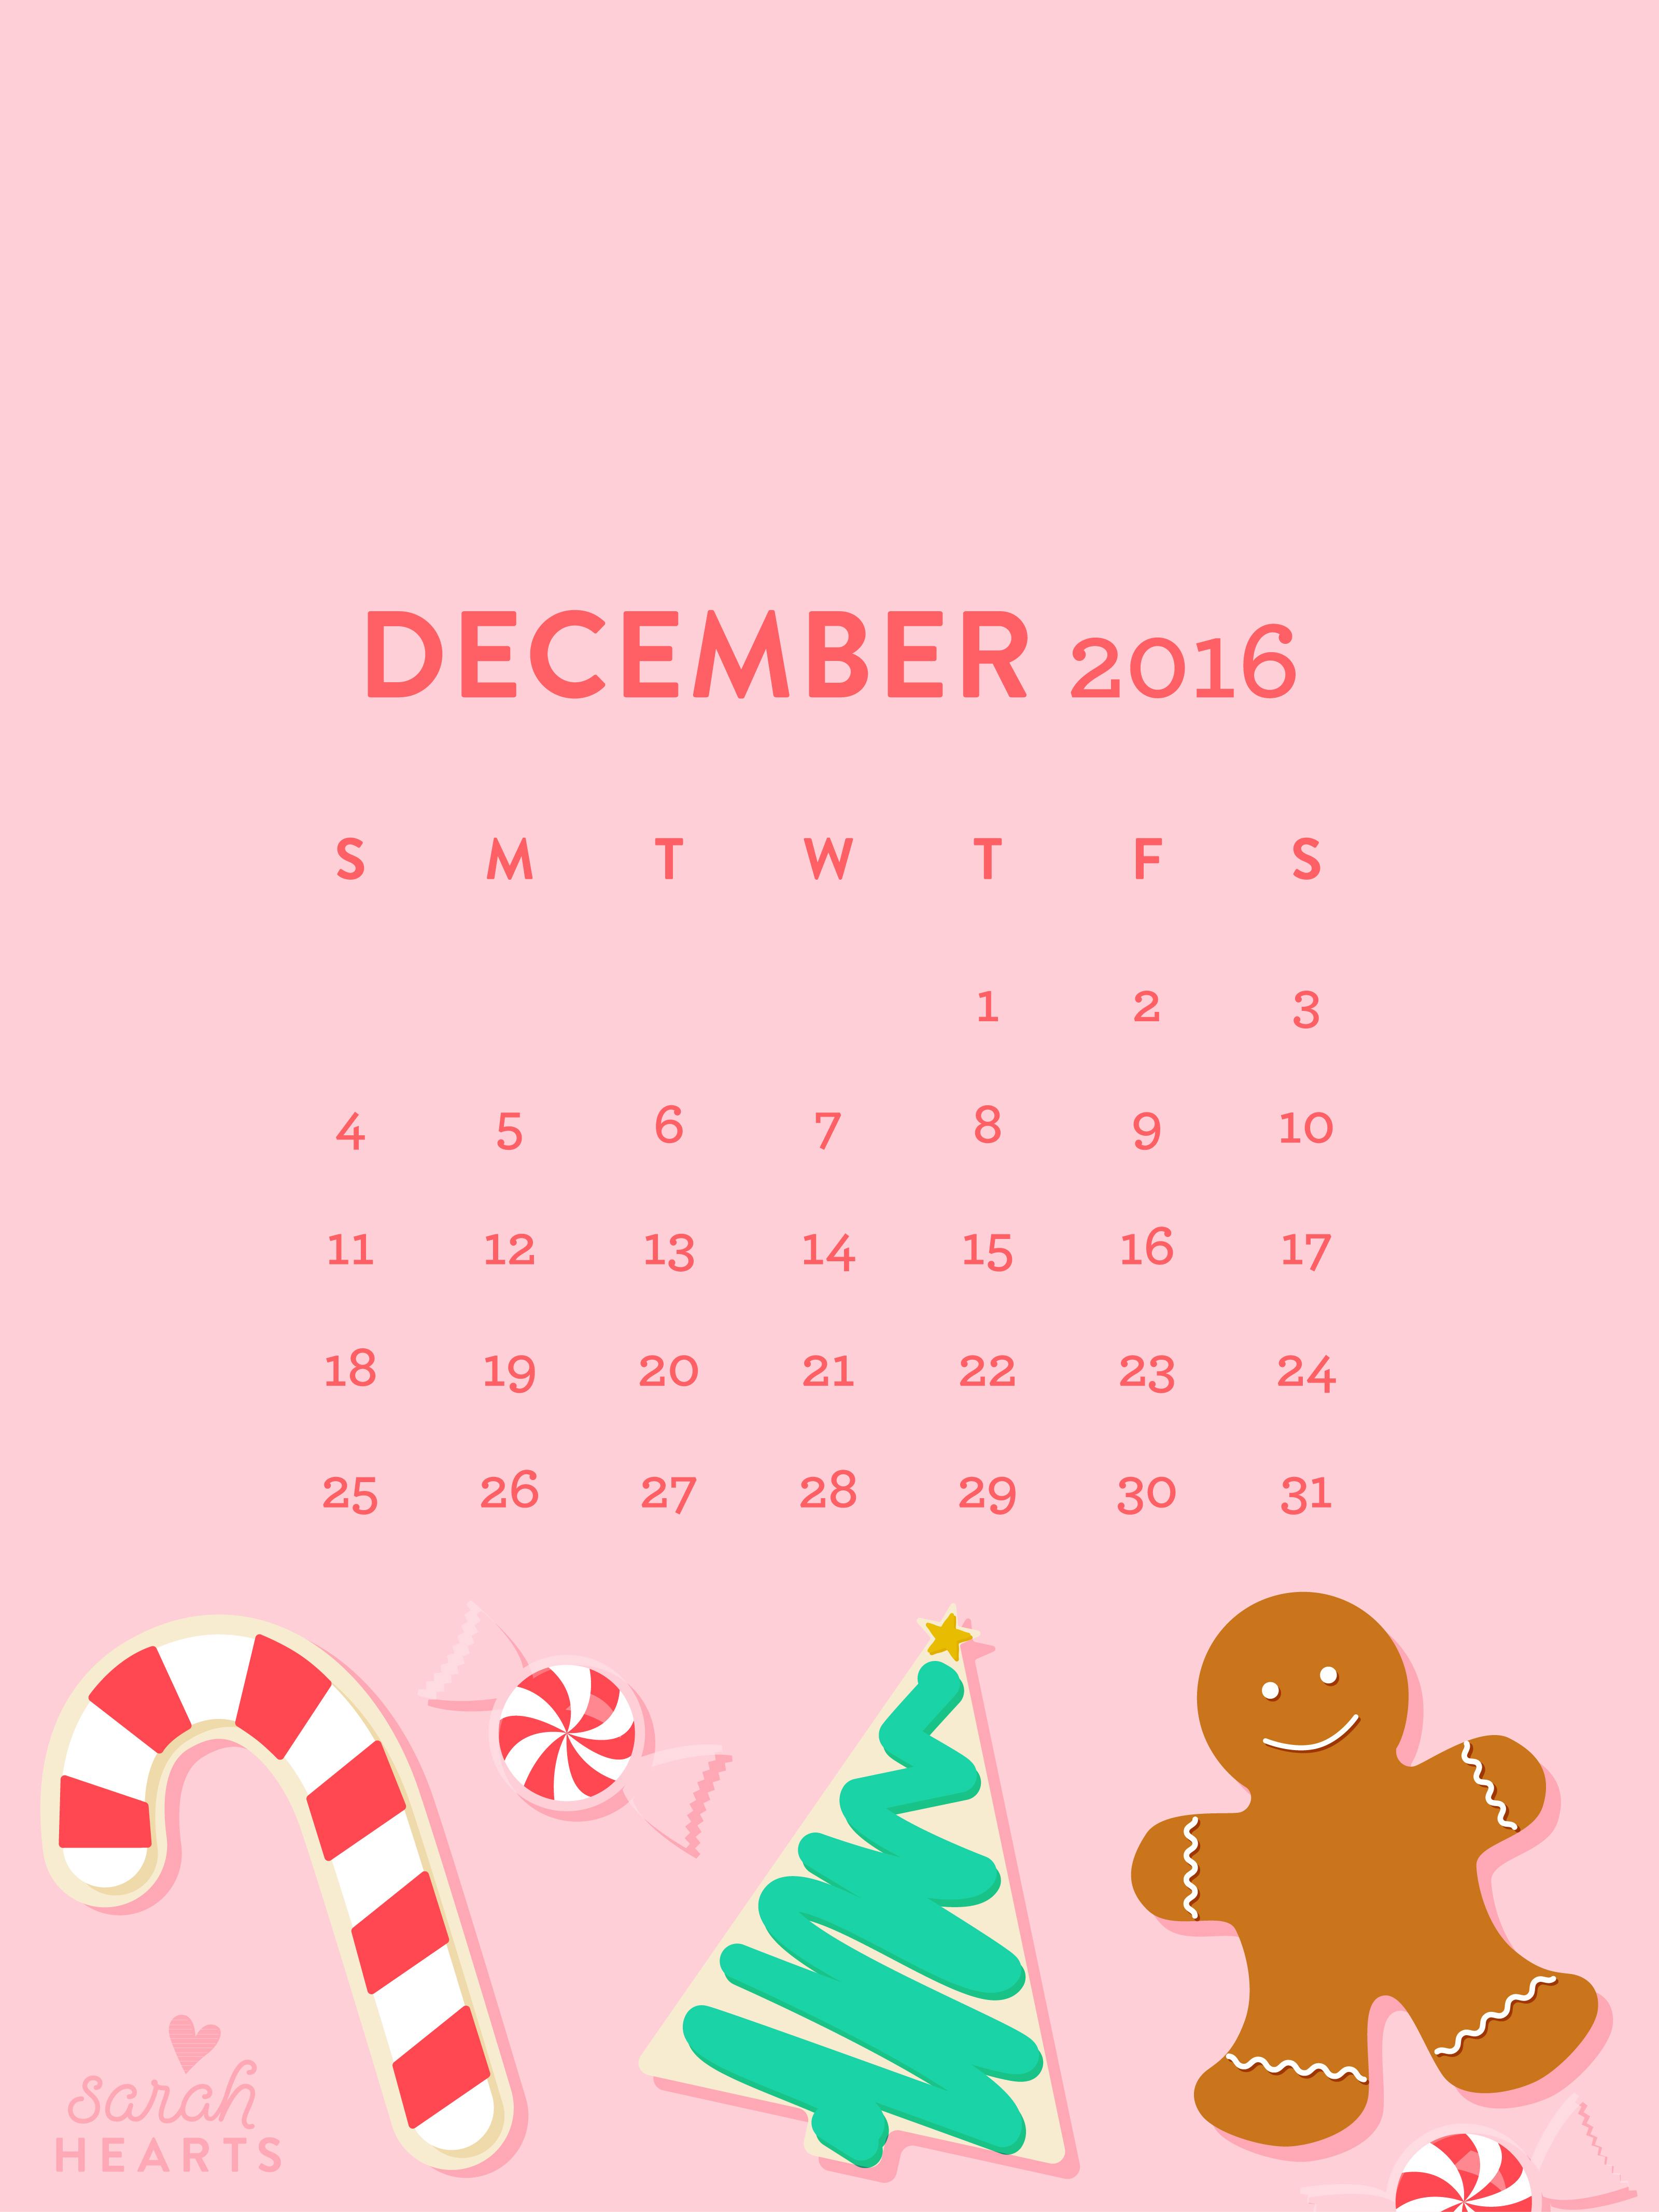 Cute Quote Wallpaper Backgrounds December 2016 Christmas Cookie Calendar Wallpaper Sarah